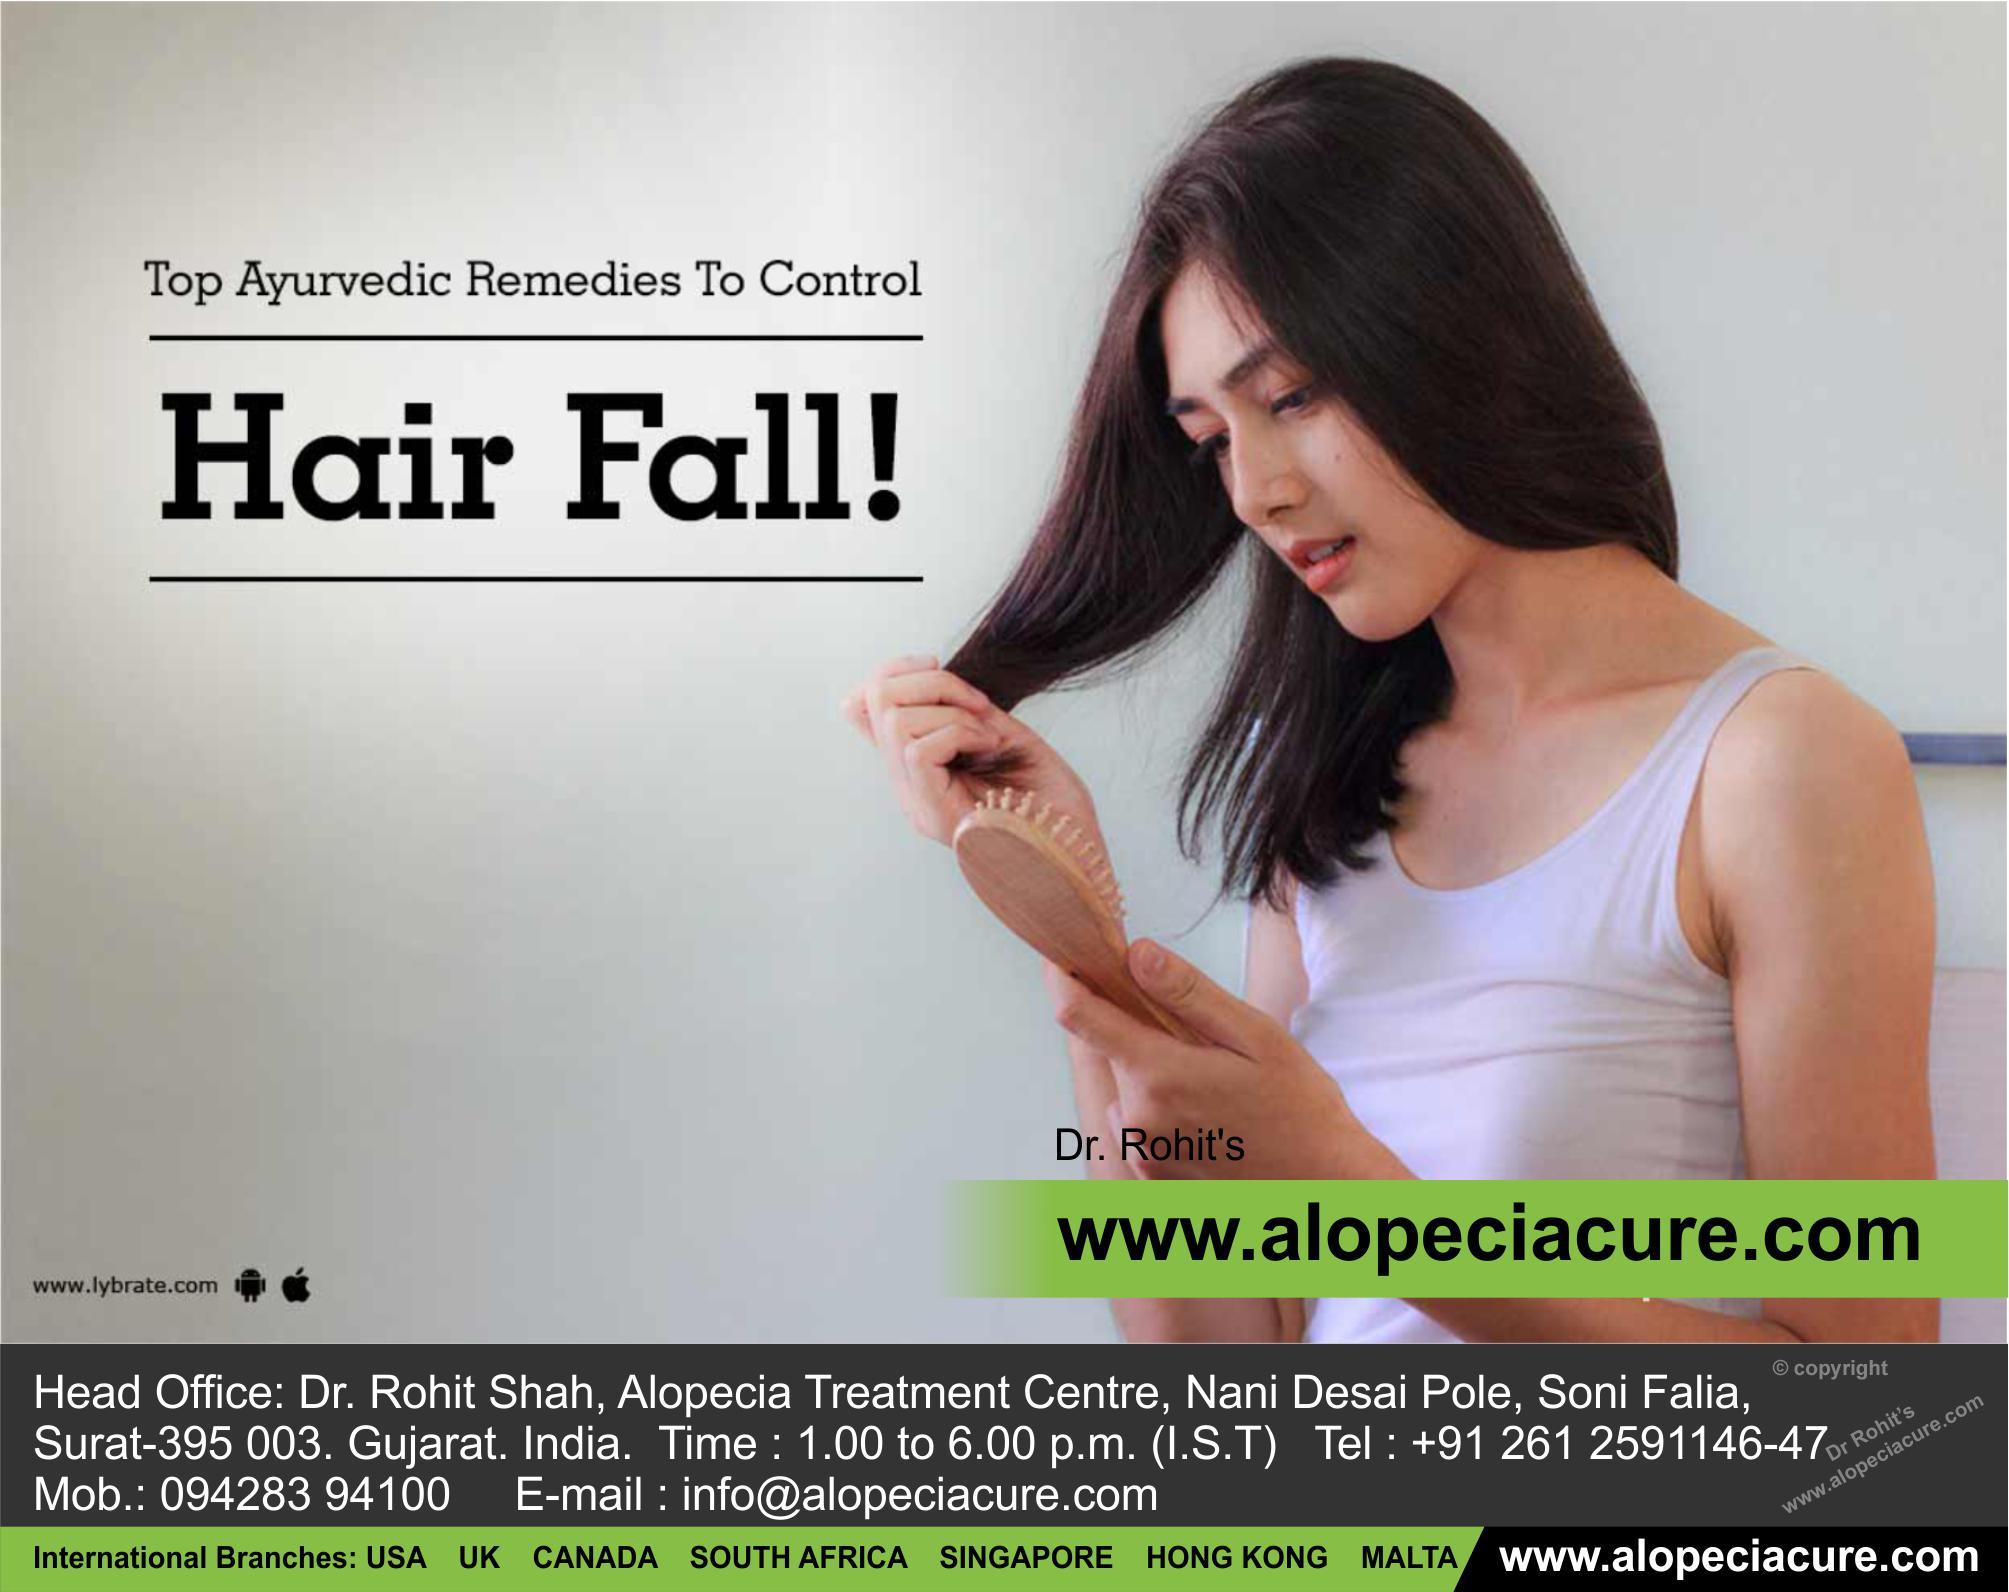 Ayurvedic Remedies to Control Hair Fall